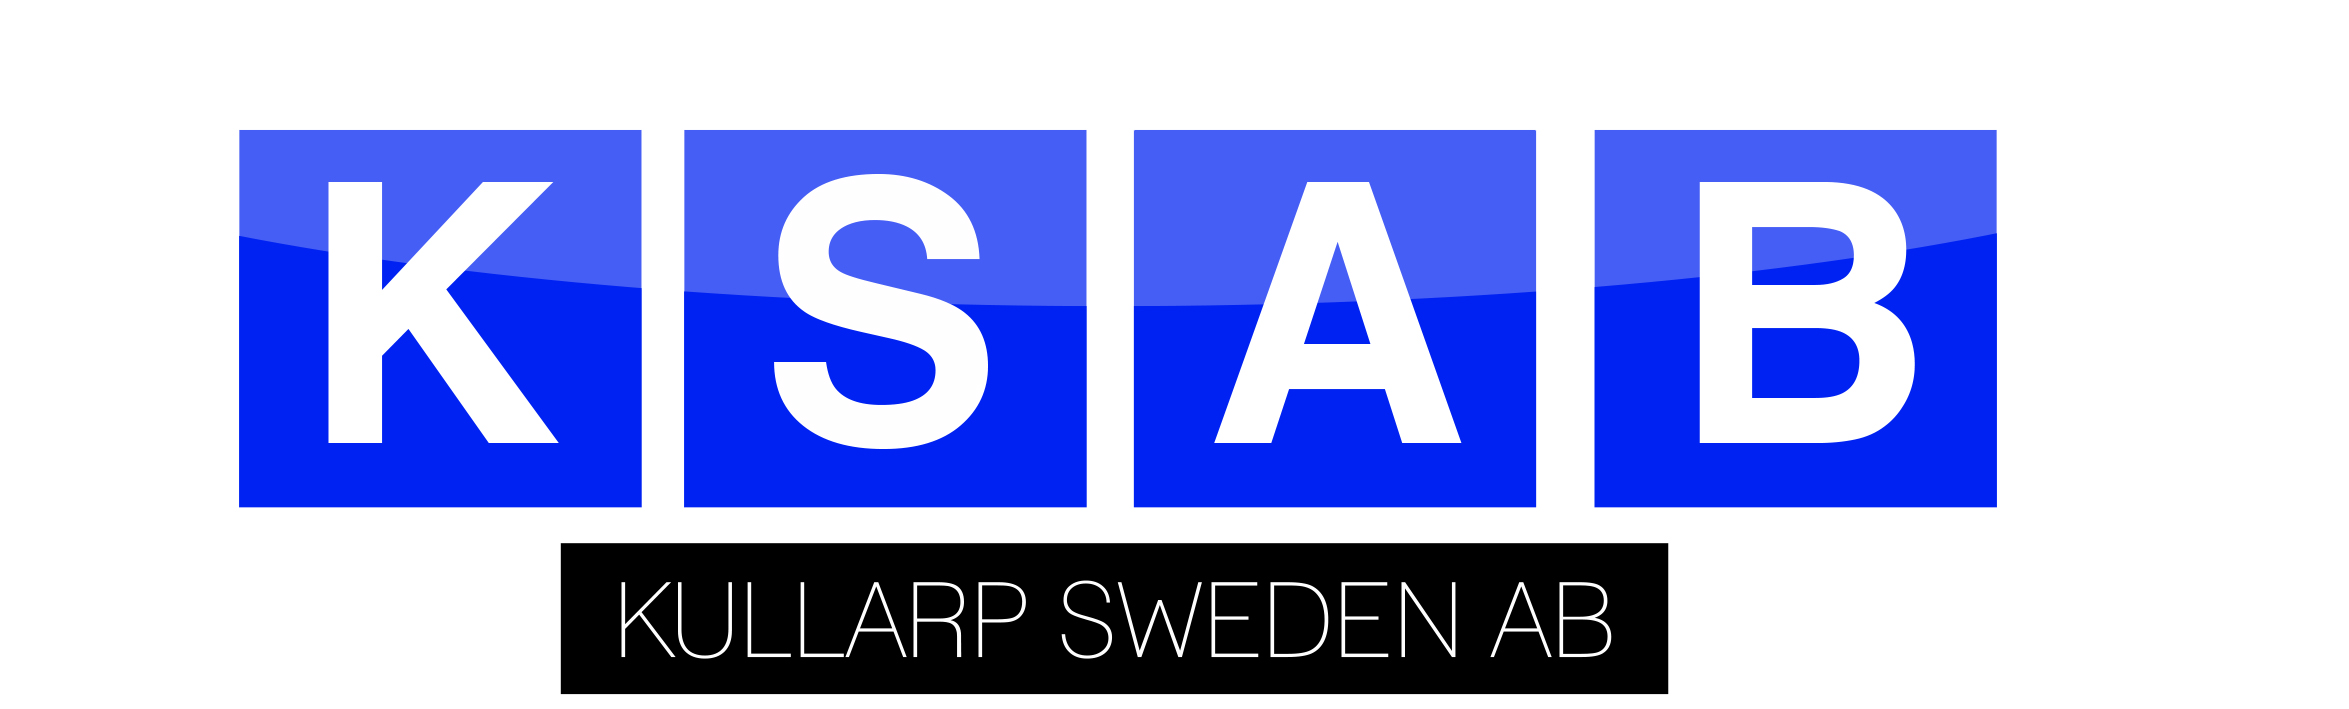 Kullarp Sweden AB